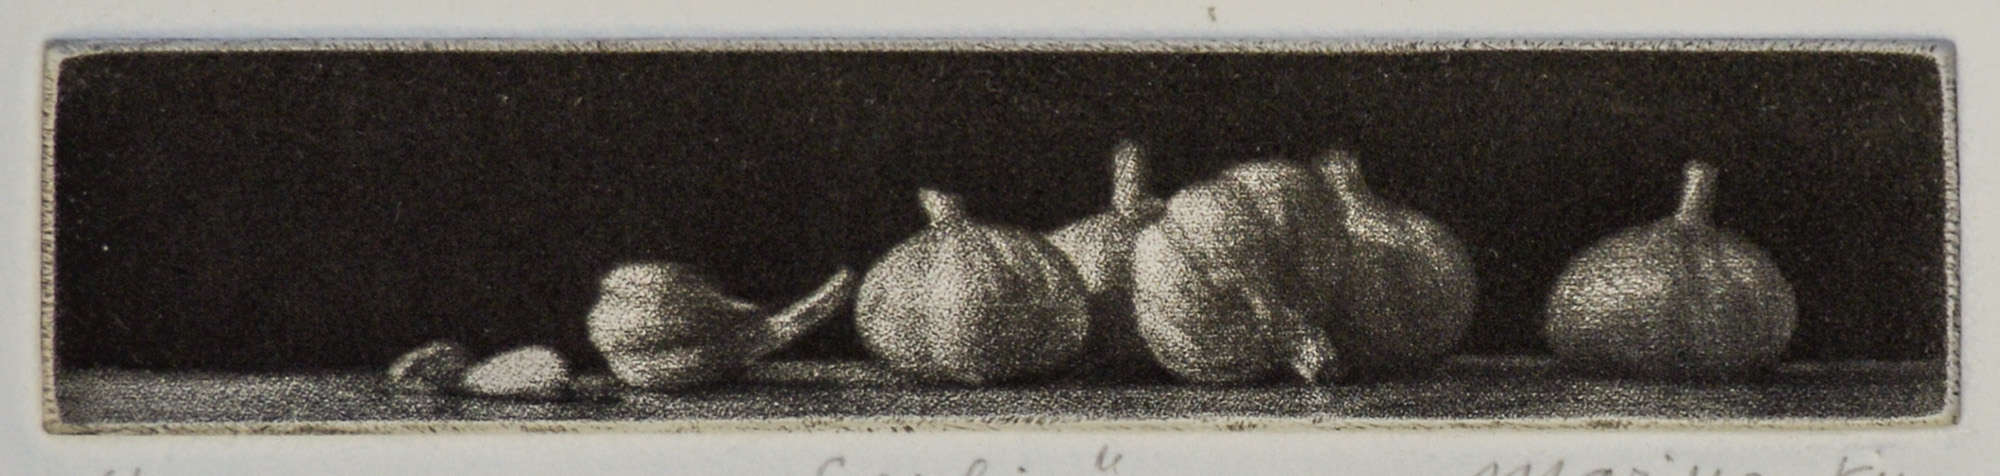 """Garlic"" - Picture of several garlic globes on a black background. Original print mezzotint by painter-printmaker Marina Kim"